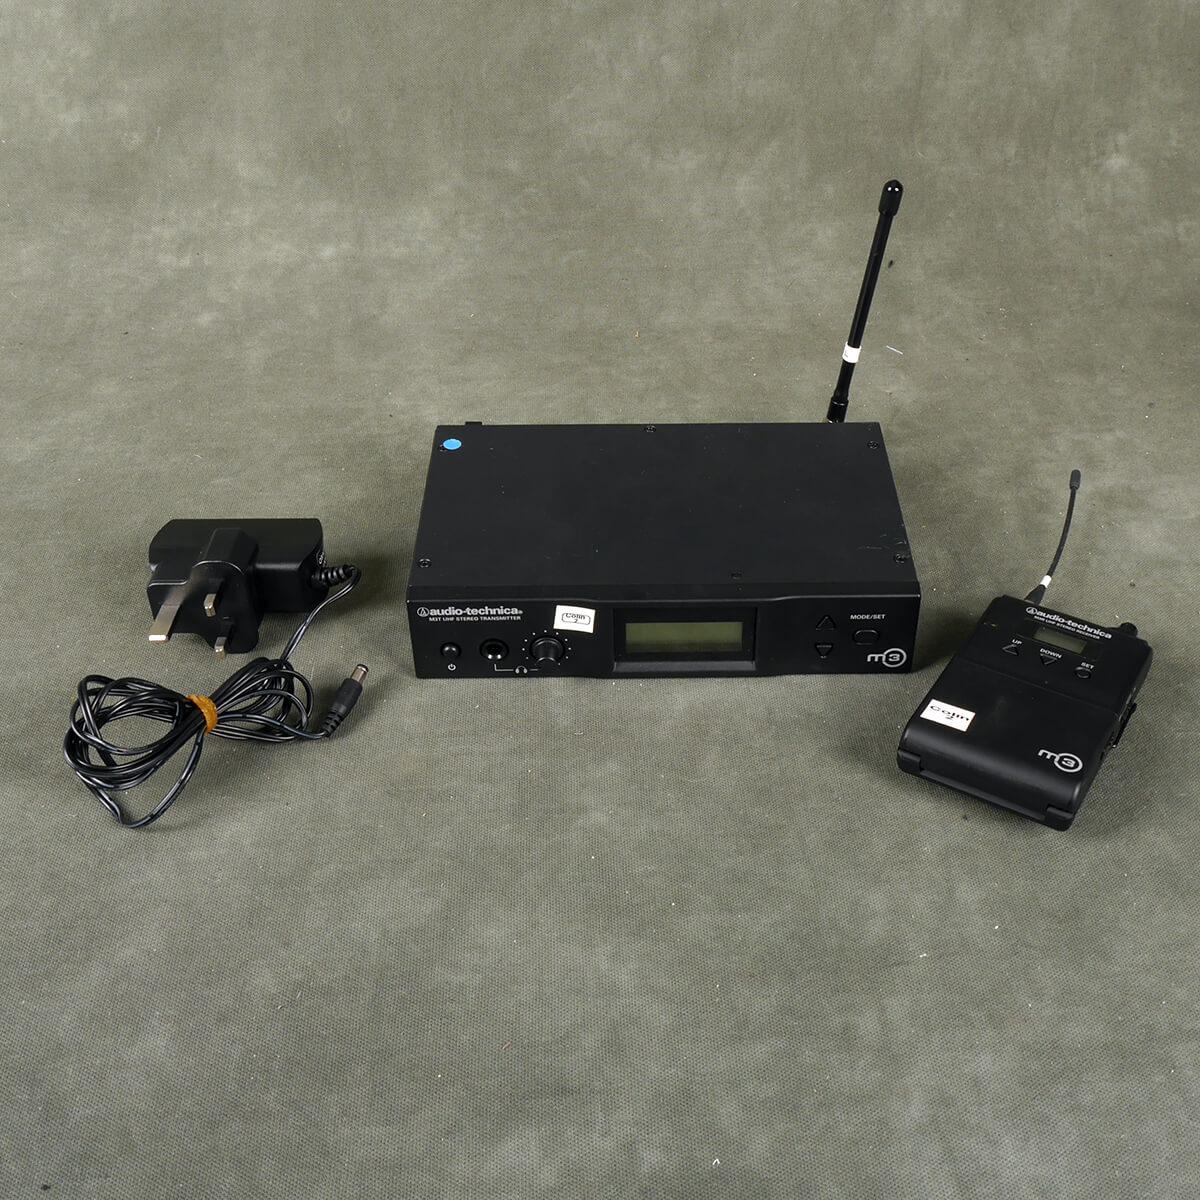 Audio Technica M3 In-Ear Monitoring Wireless Kit - 2nd Hand